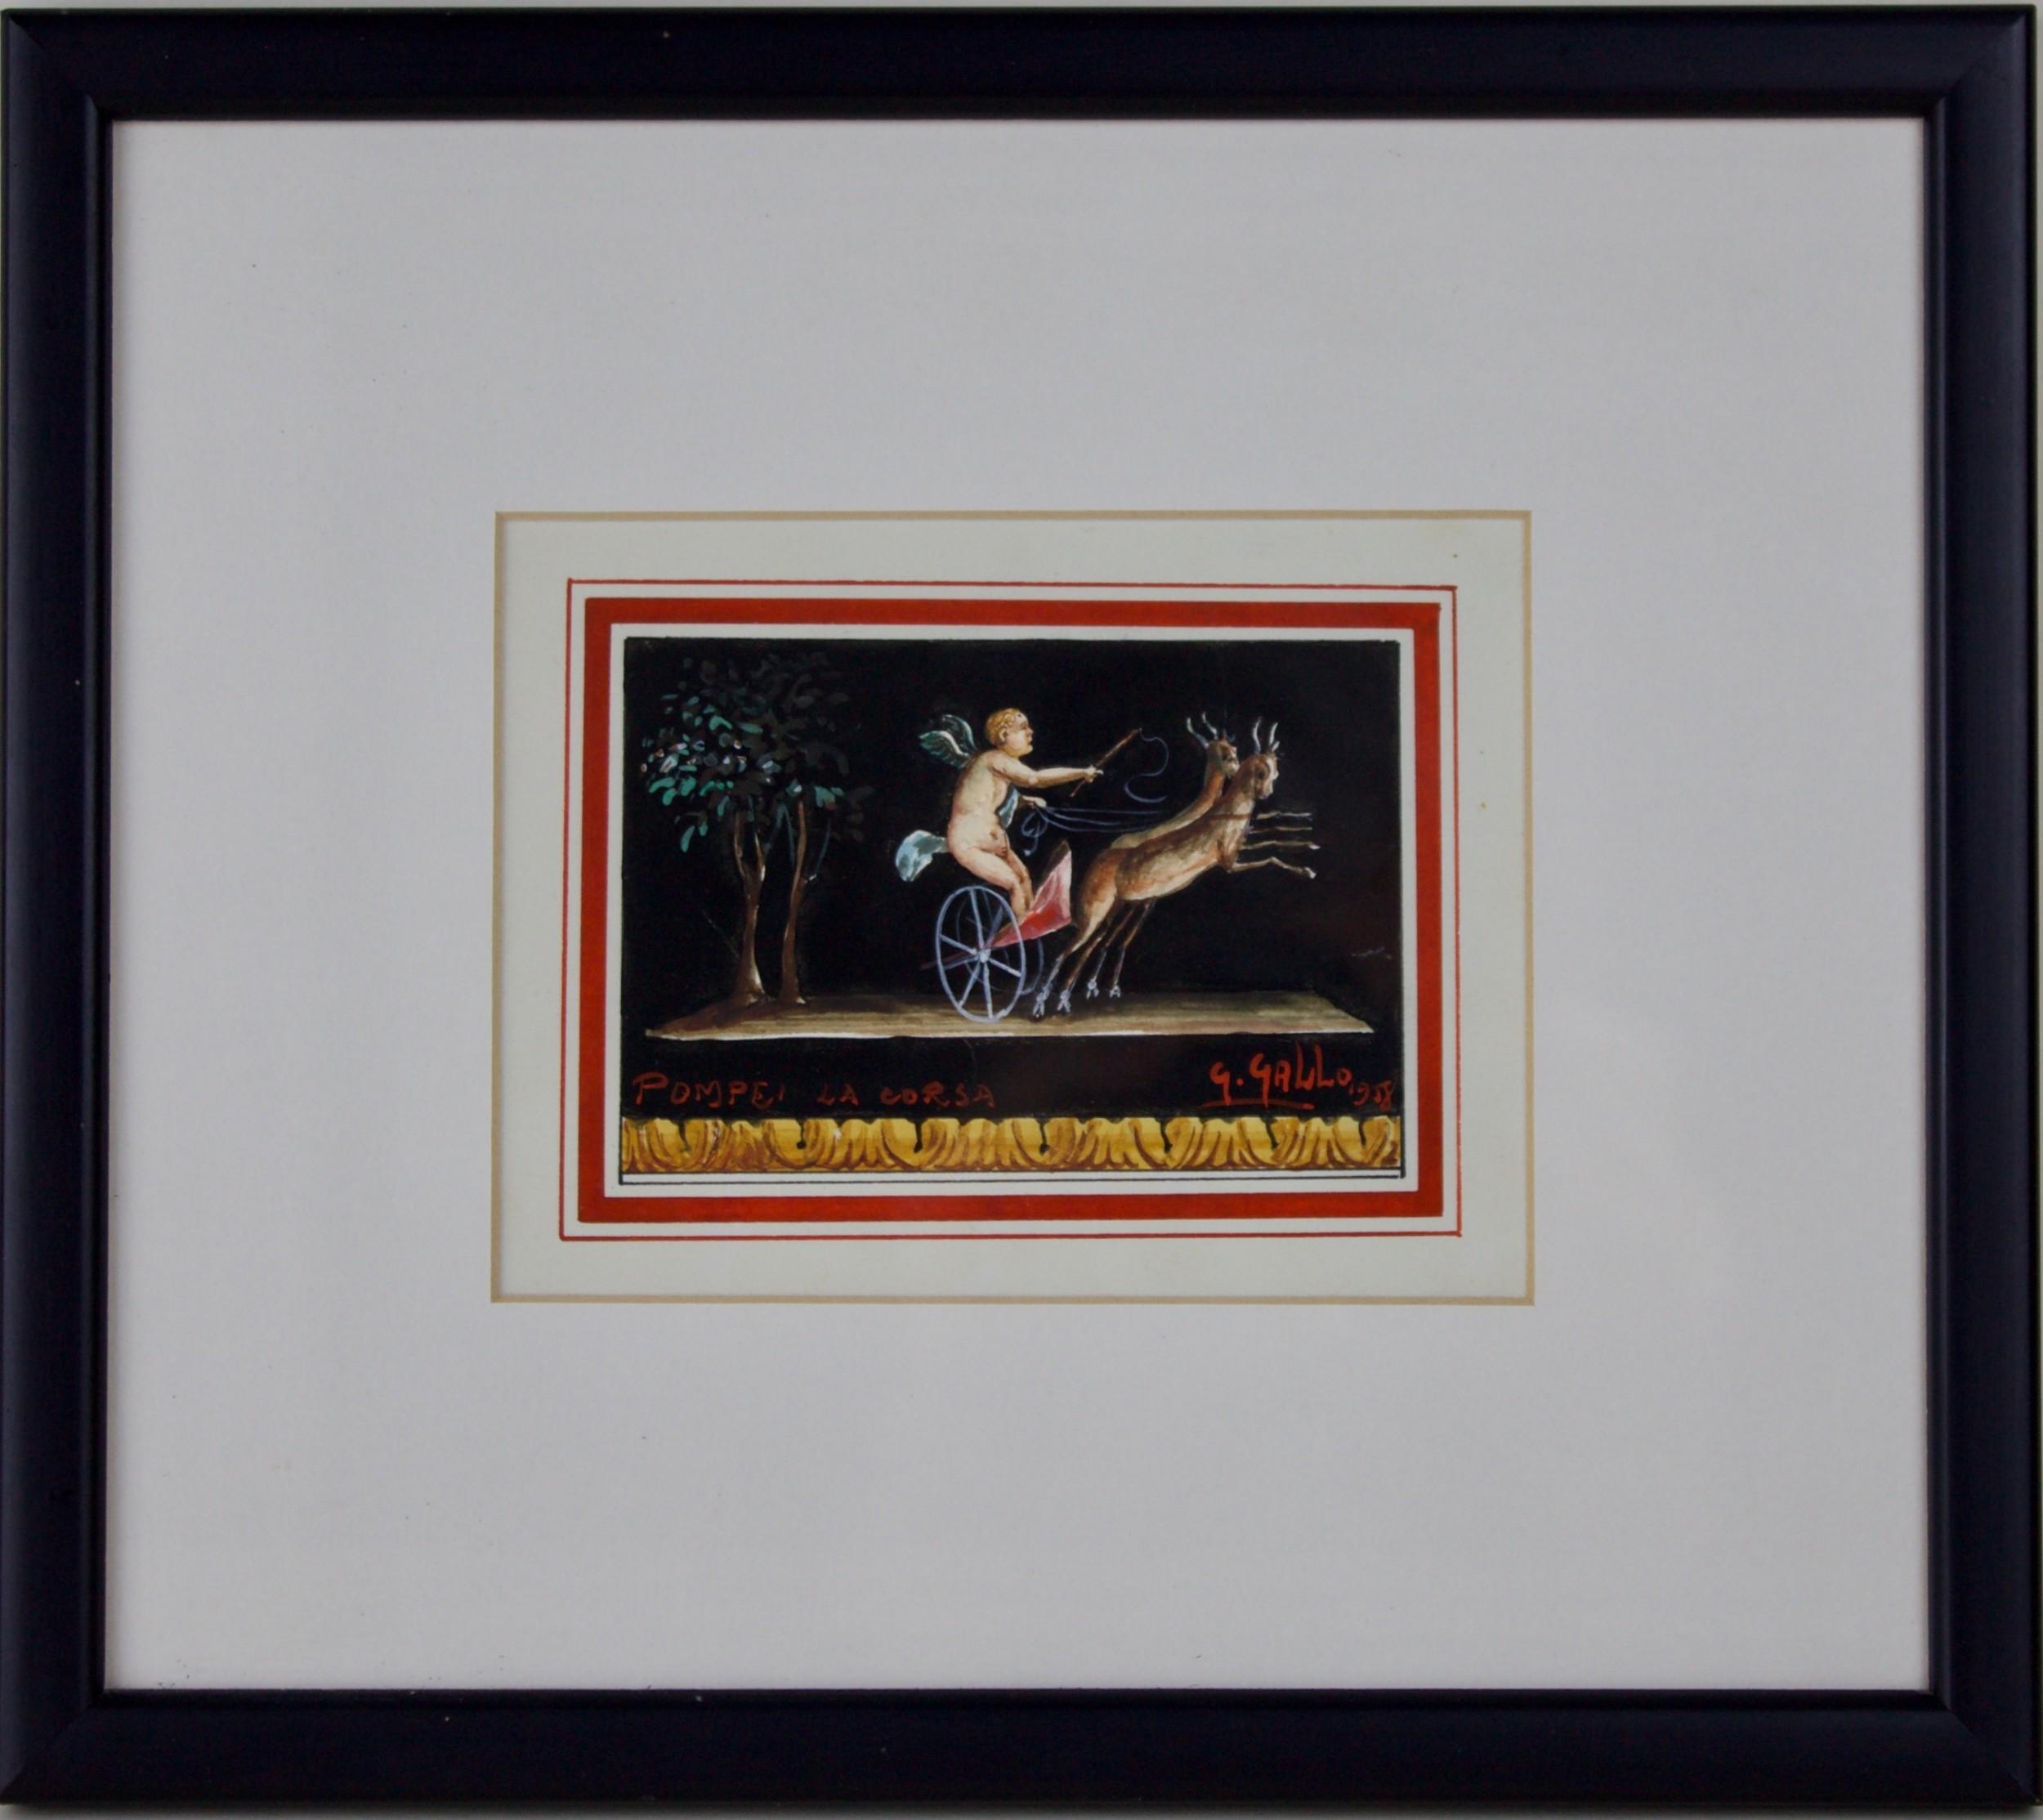 giovanni gallo italian gouache painting